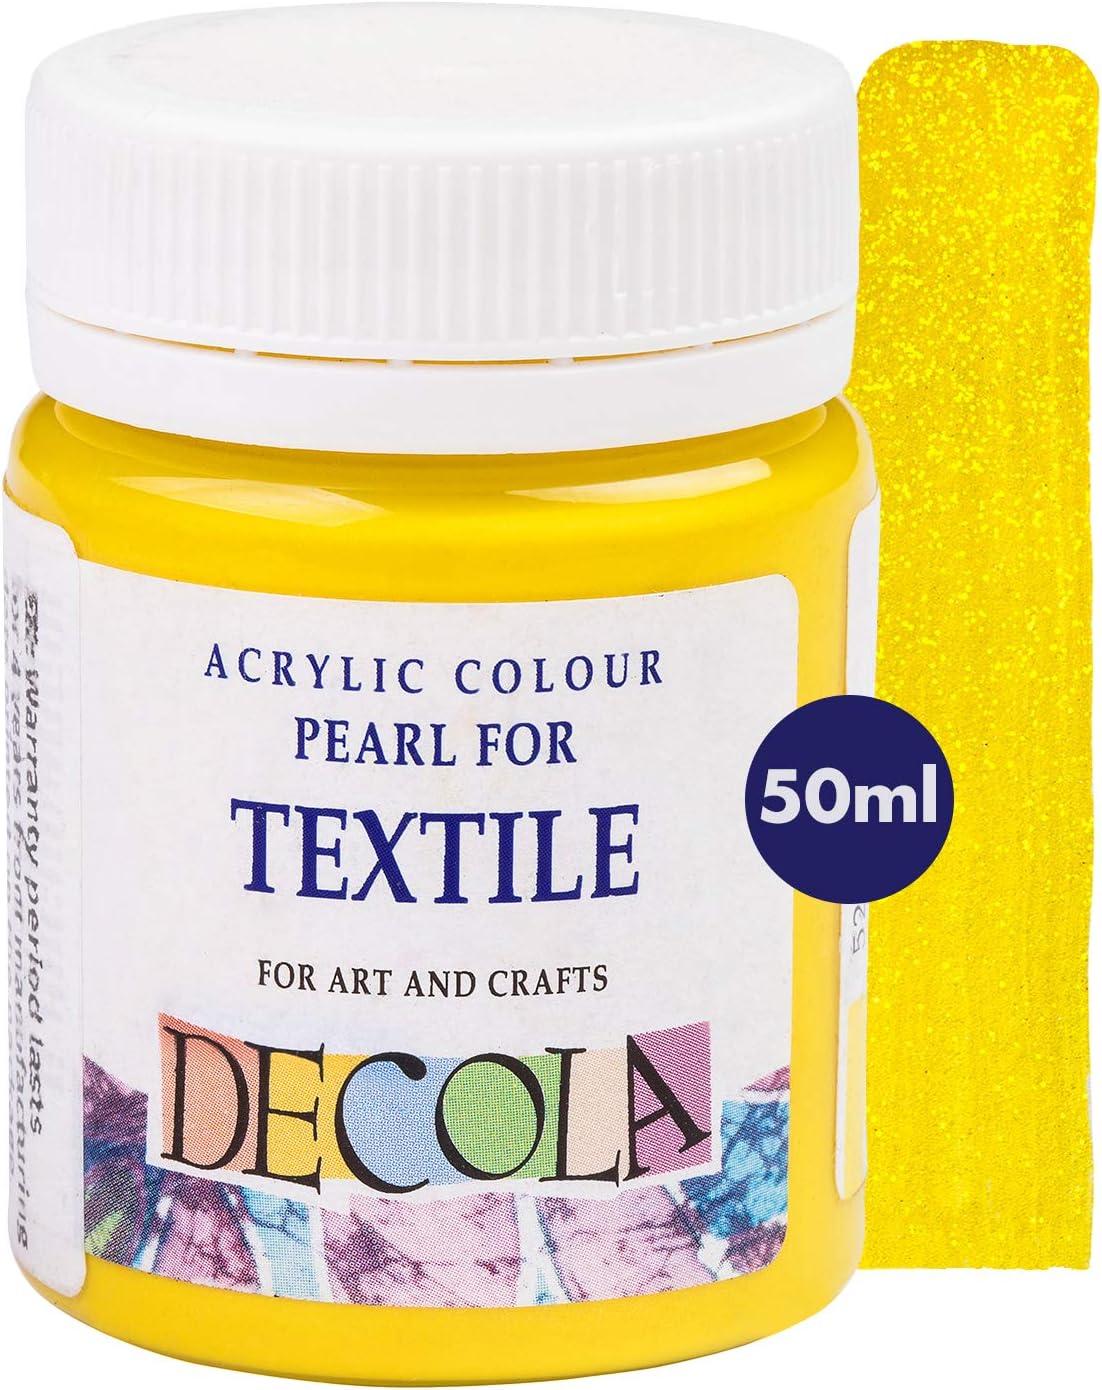 Pintura Textil Efecto Purpurina Amarilla 50ml   Colores Con Alta Pigmentación   Hecho En Rusia Por Neva Palette